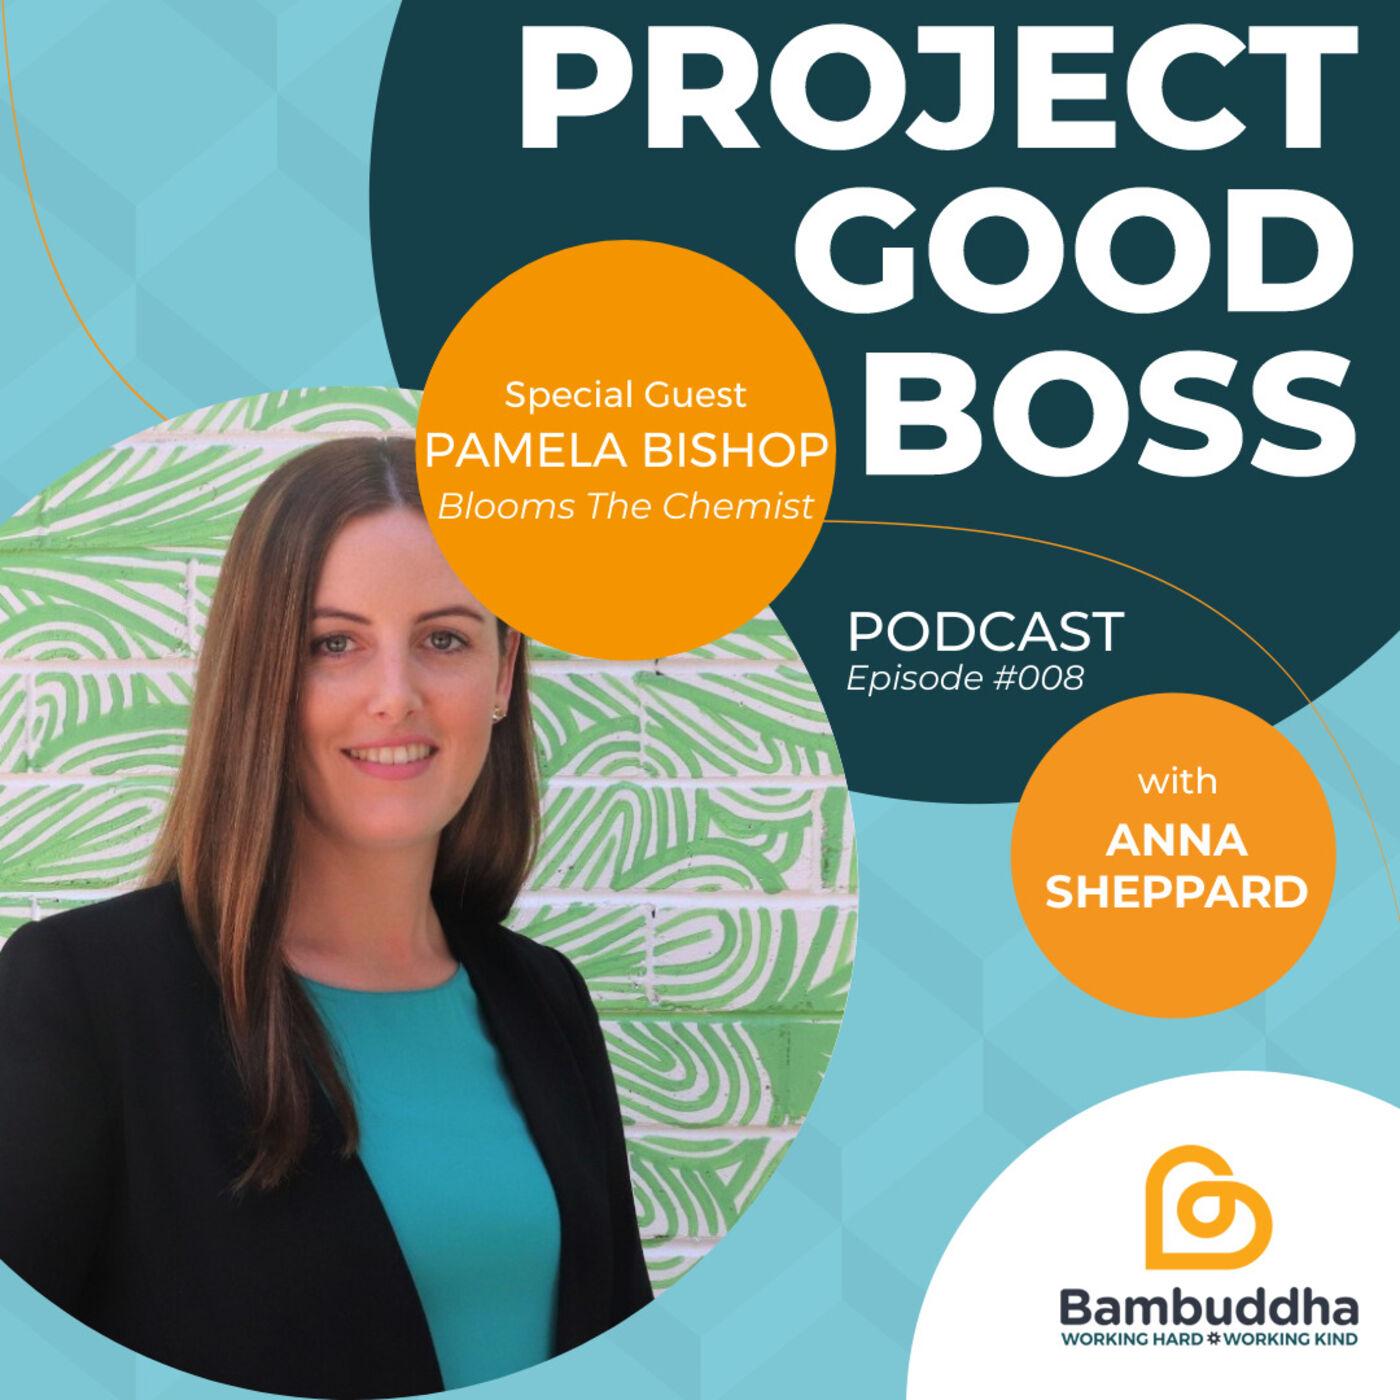 Pamela Bishop on Corporate Social Responsibility